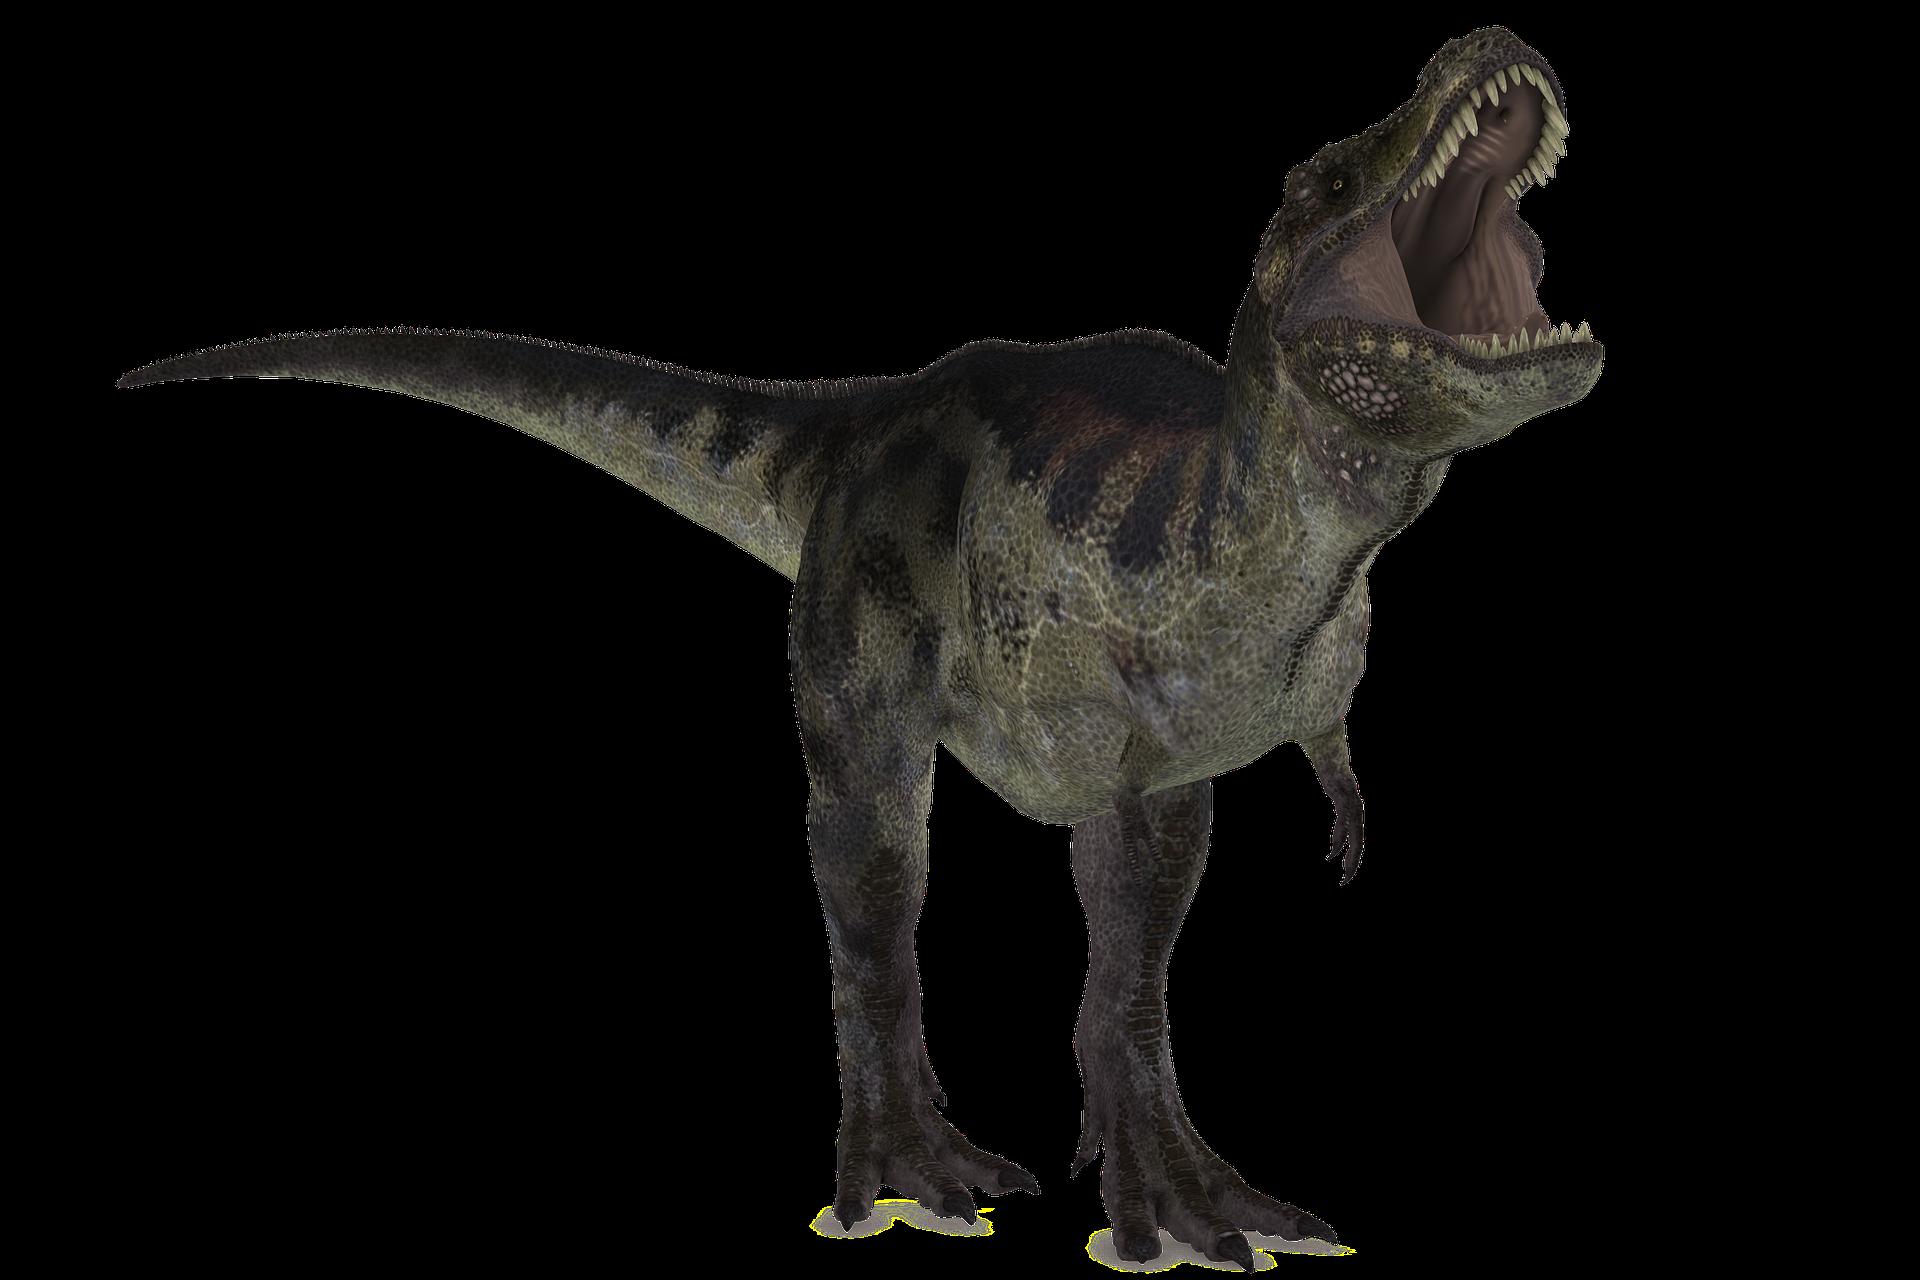 t-rex-5668607_1920.png